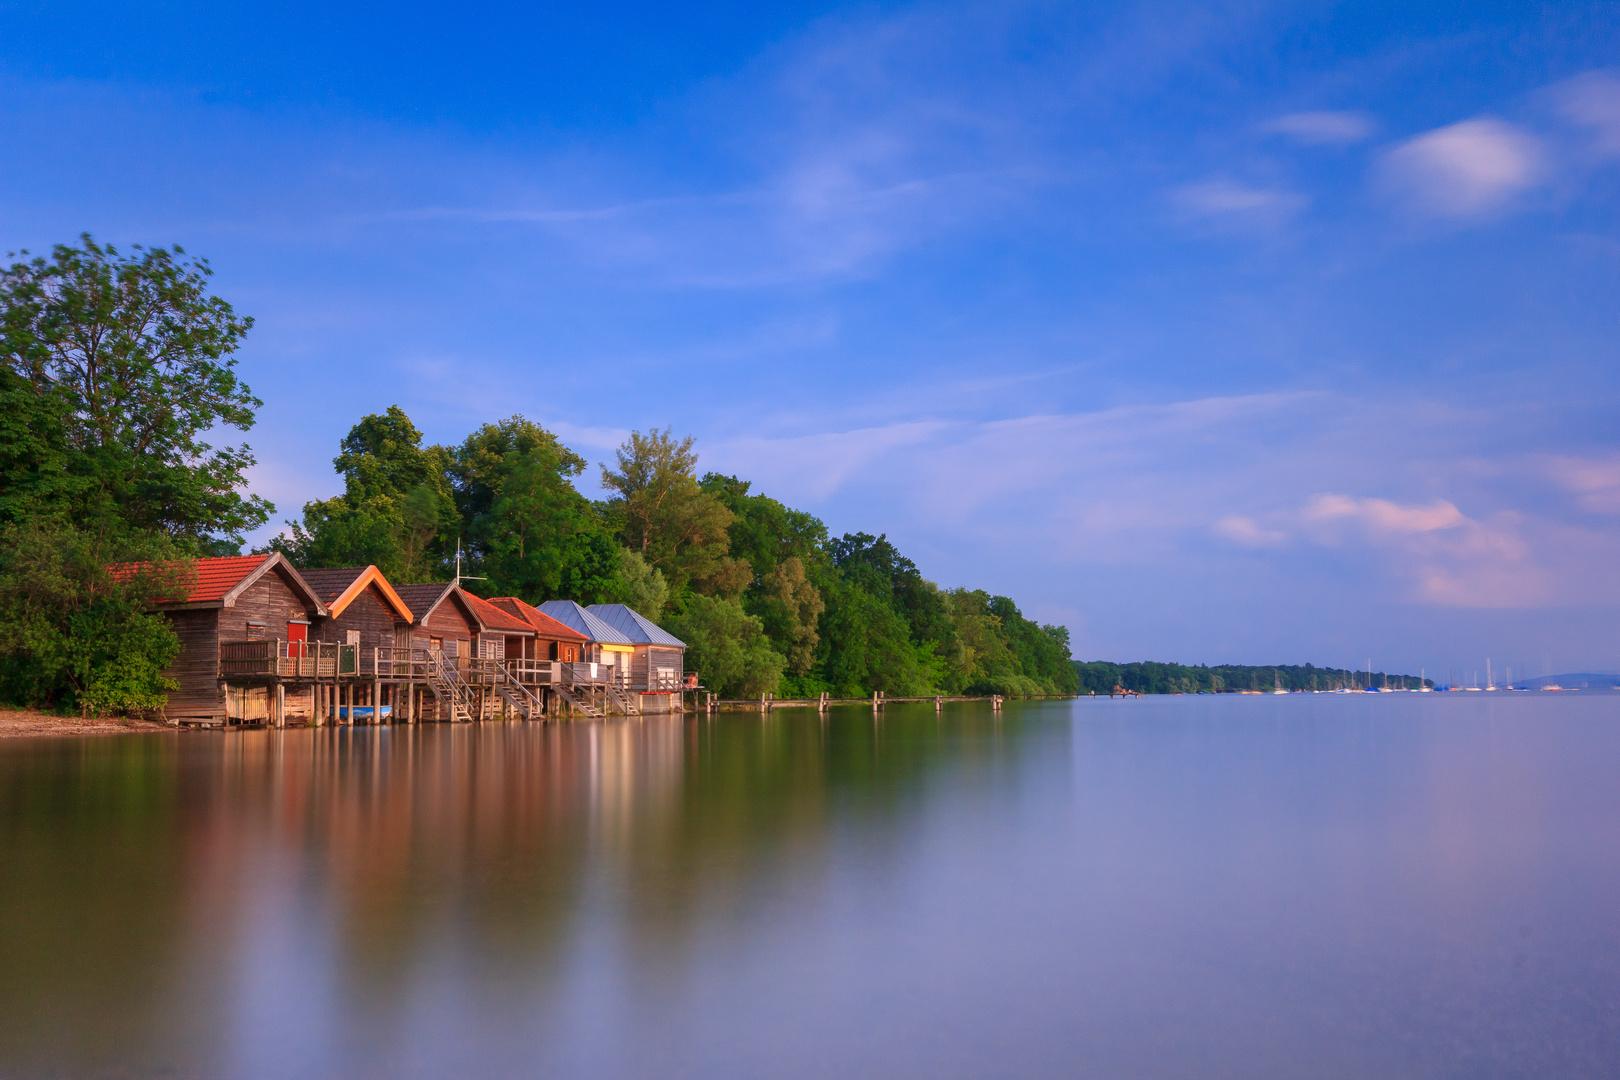 Bootshütten am Ammersee